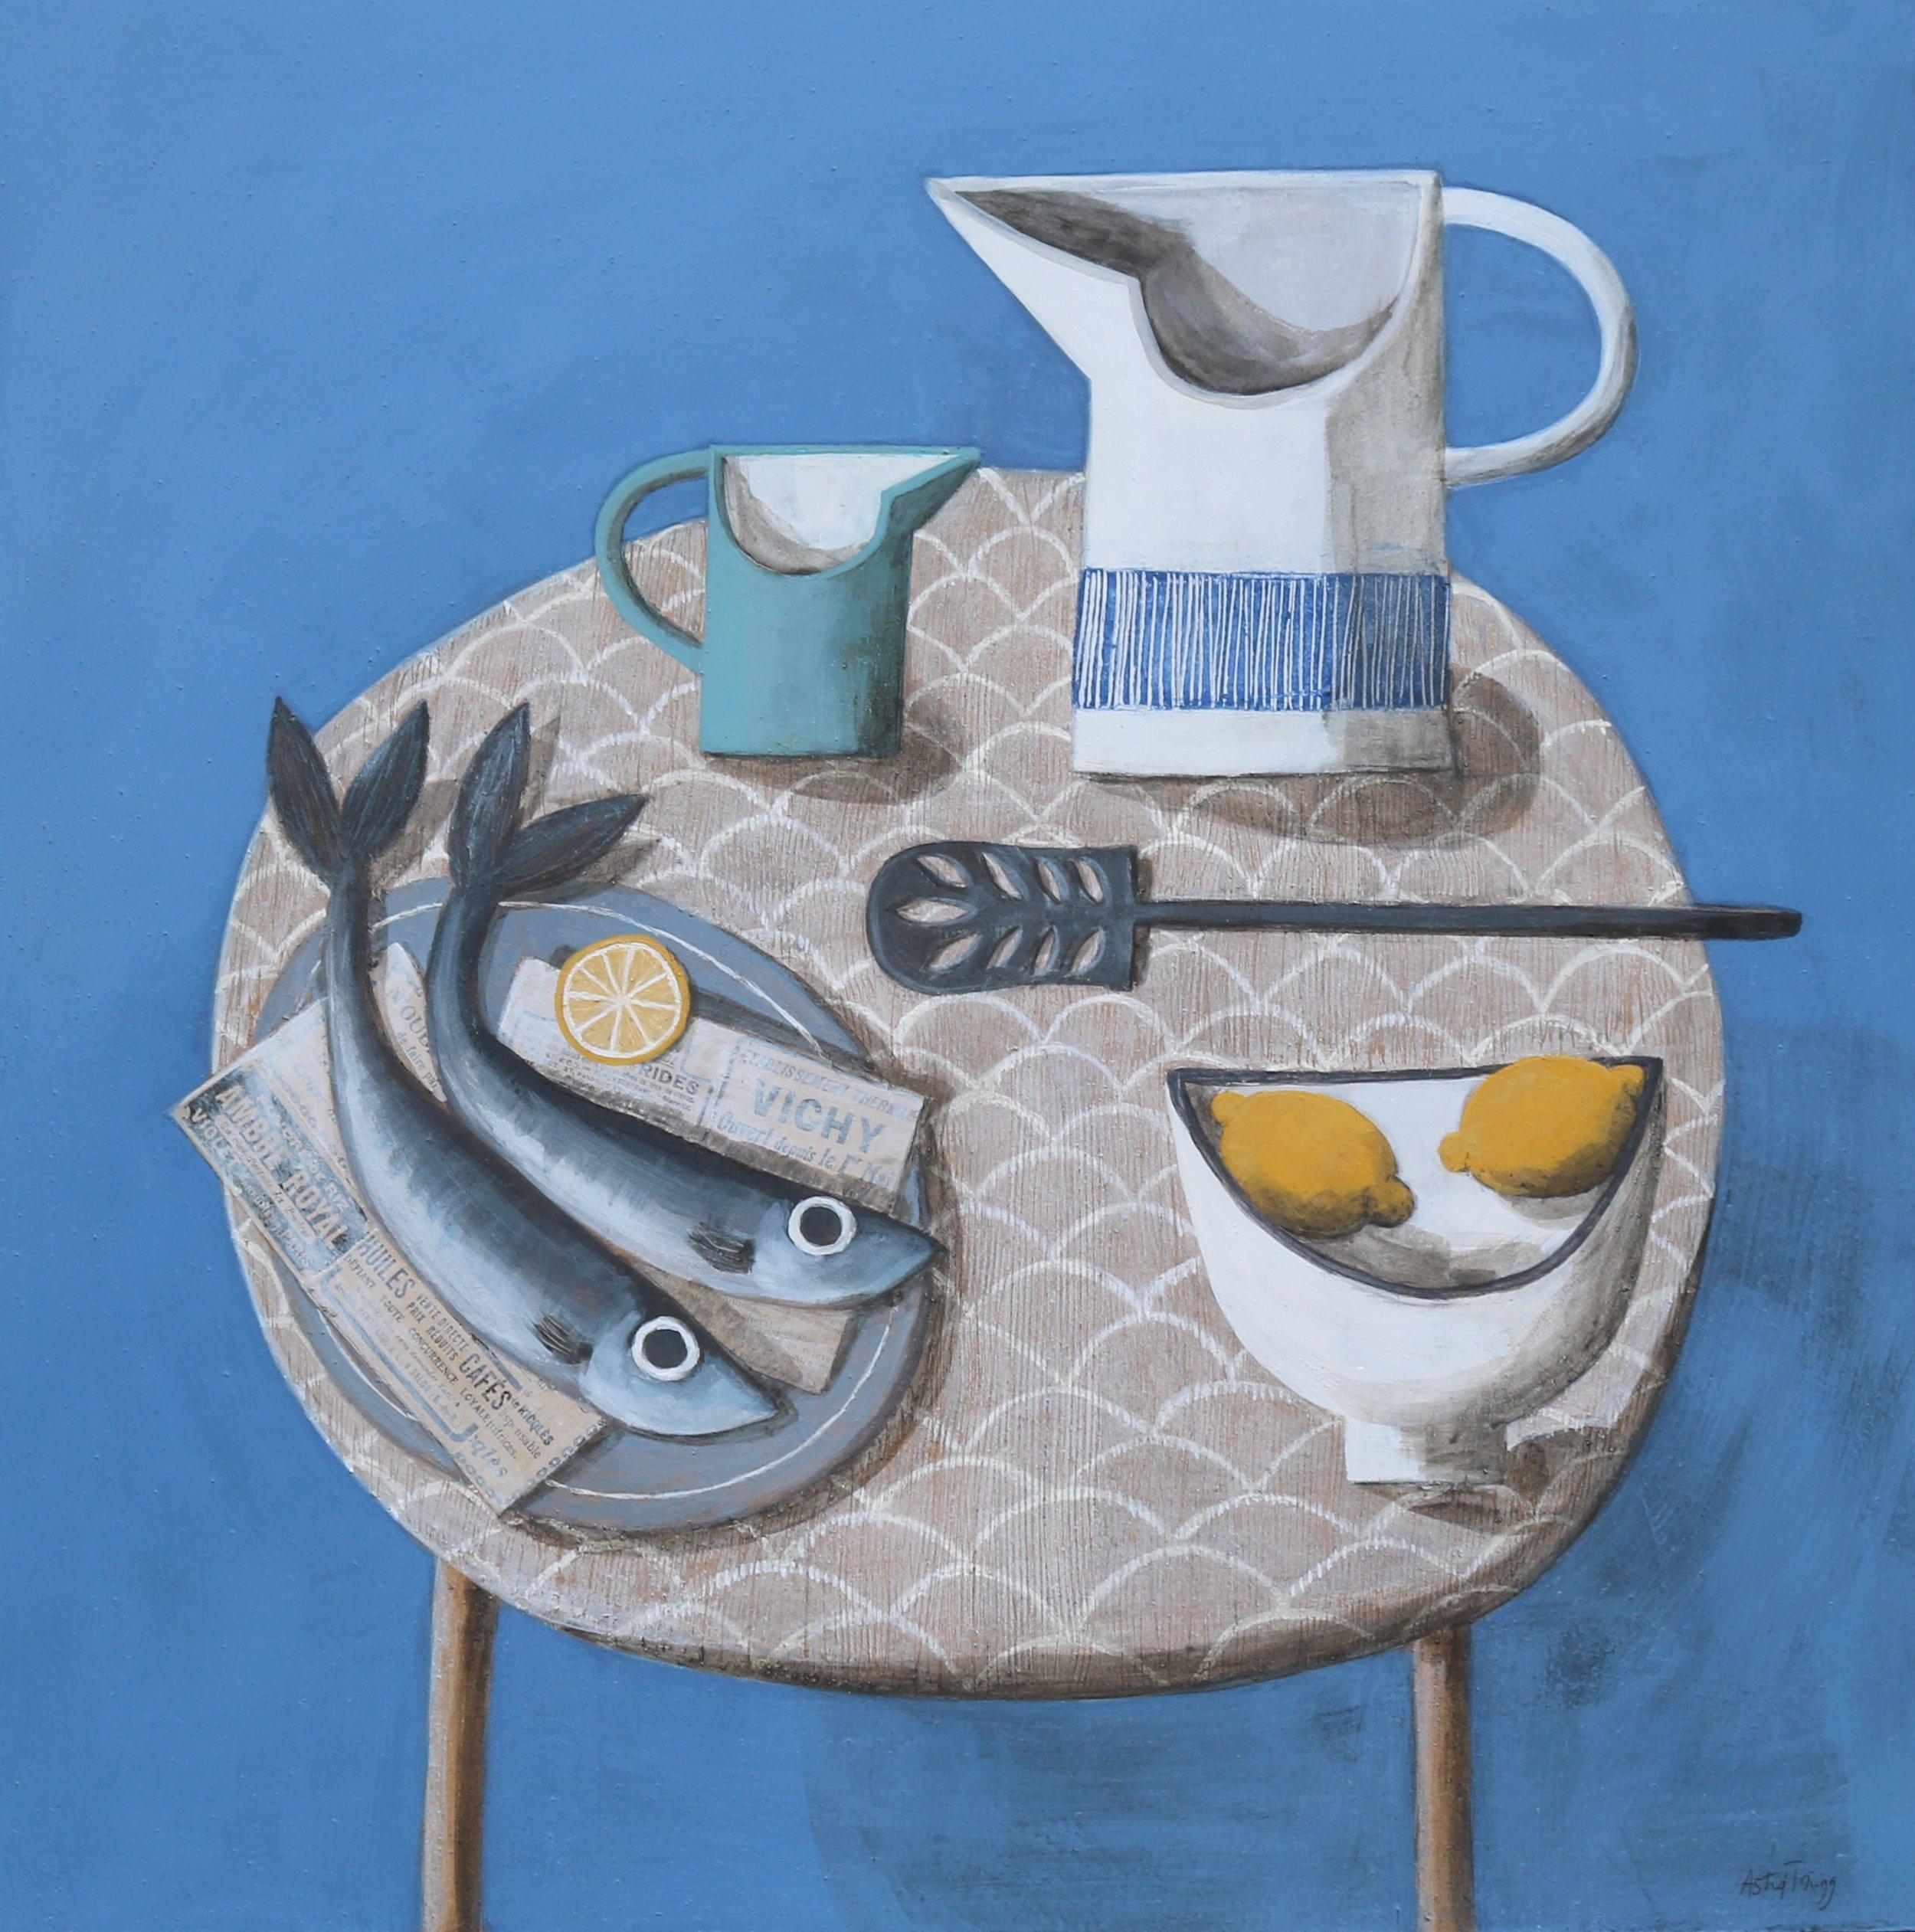 Astrid Trugg Work Still life in blue with jugs and fish (medium).jpg